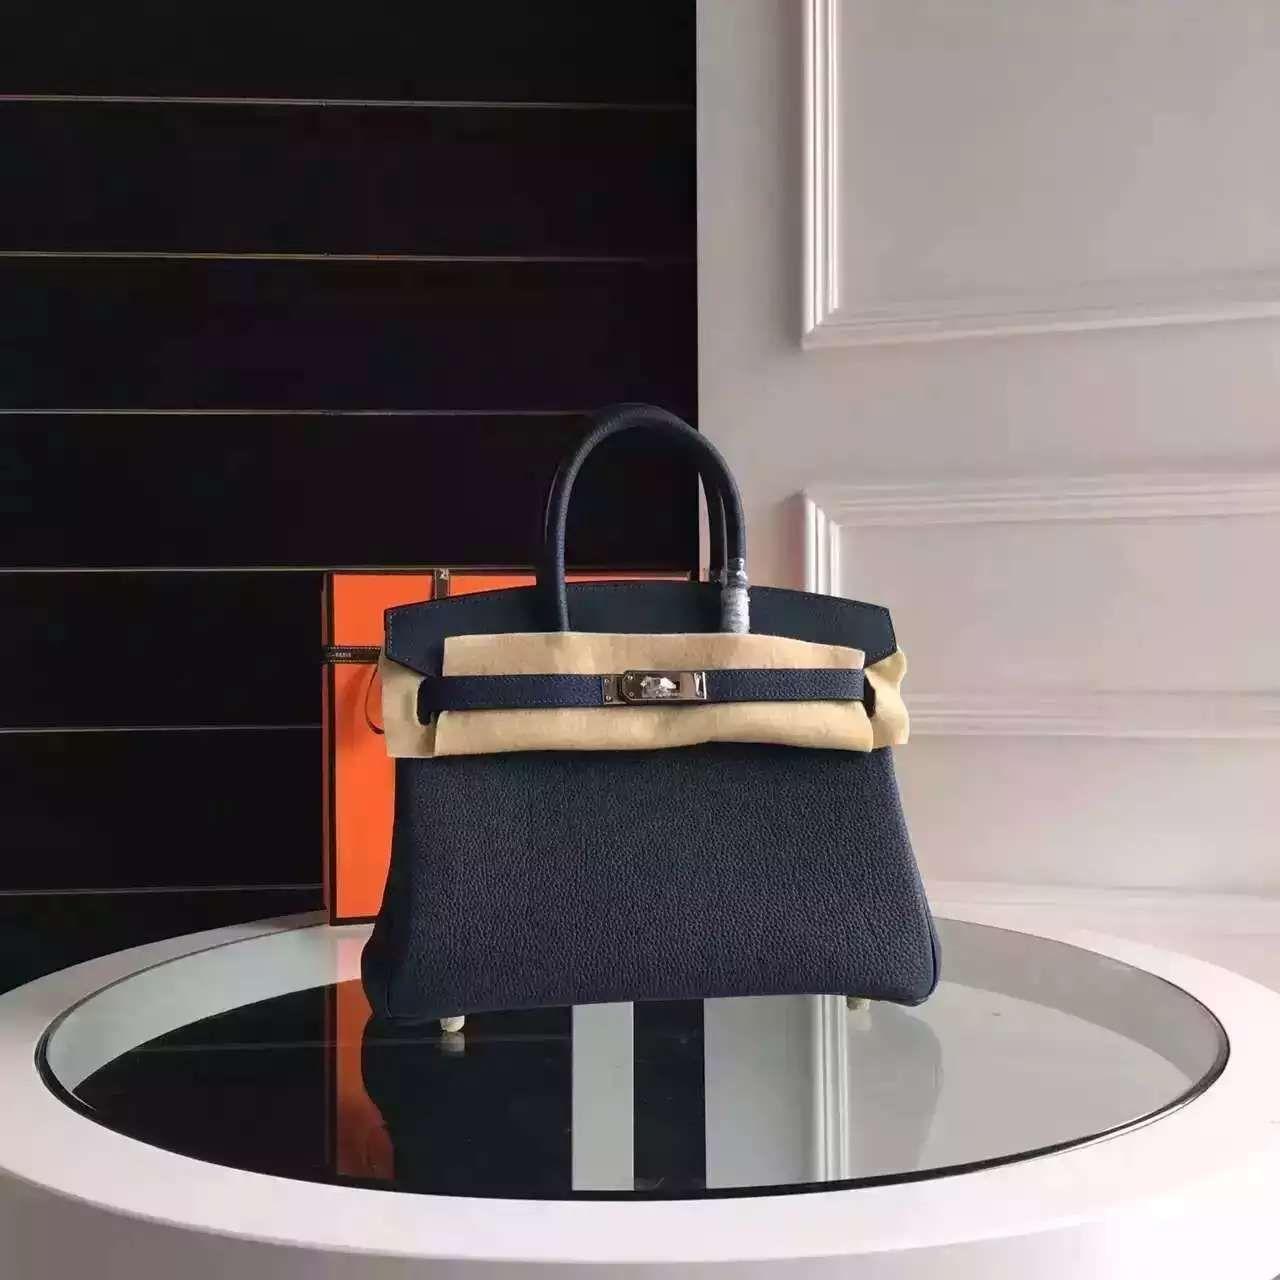 hermès Bag, ID : 45992(FORSALE:a@yybags.com), collection hermes, attribut de hermes, hermes ladies designer handbags, hermes handbag purse, hermes mens briefcase, hermes womens backpack, hermes designer wallets, hermes slim leather briefcase, hermes designer handbags for cheap, hermes purse stores, hermes boys backpacks #hermèsBag #hermès #hermes #brand #name #purses